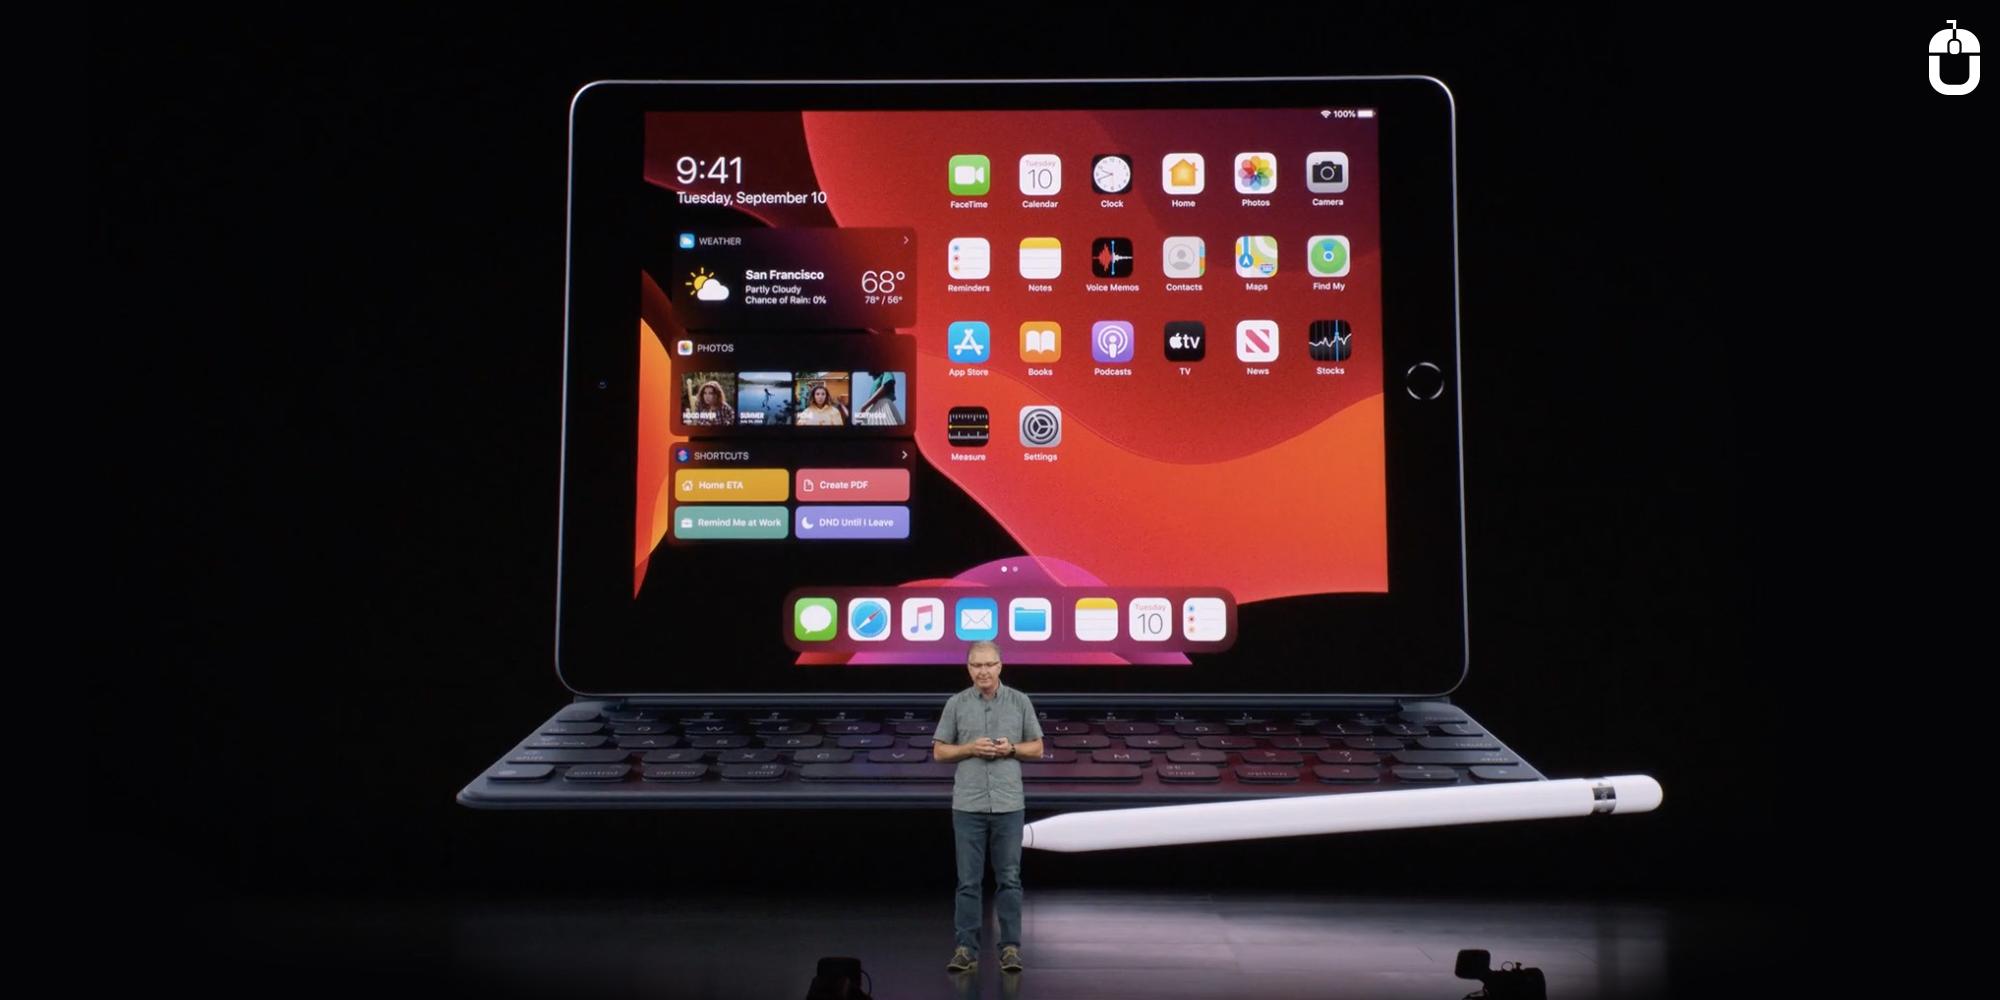 7th Generation iPad